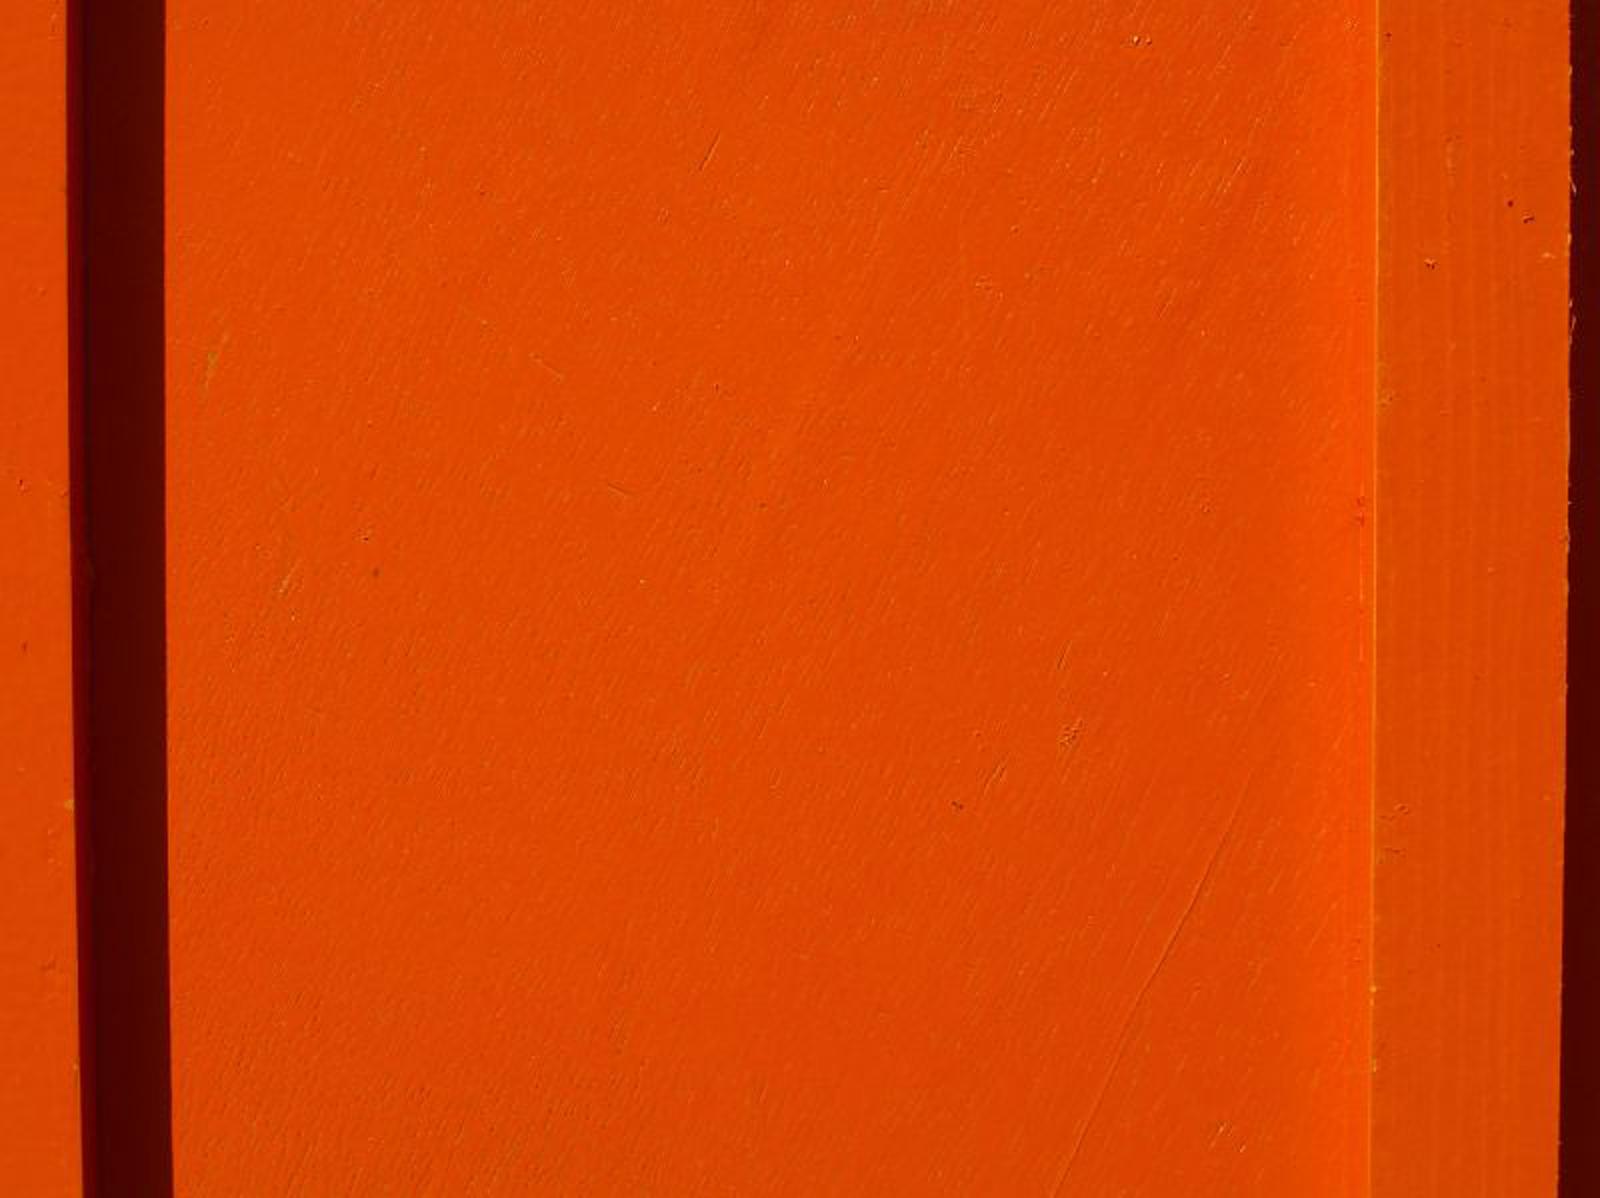 orange_shadow_3.jpg